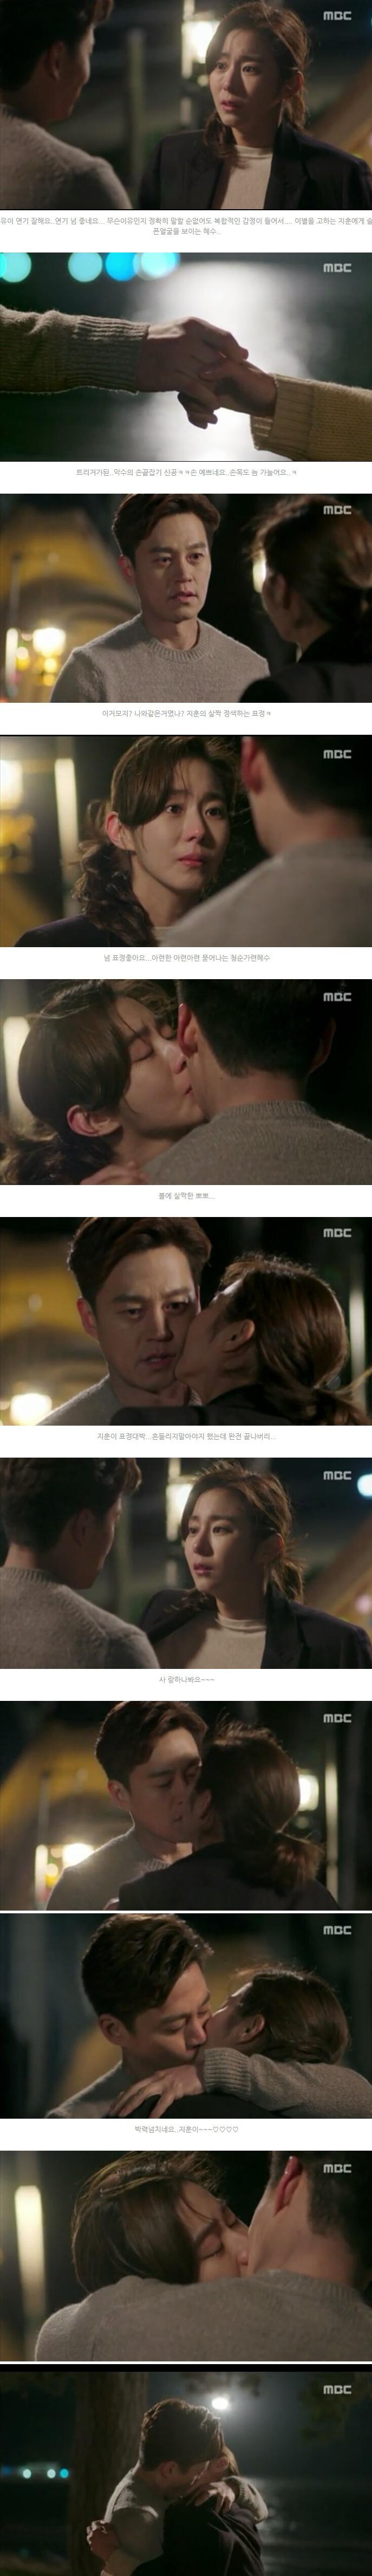 Marriage Contract Ep 9 : marriage, contract, Marriage, Contract, (결혼계약), Korean, Drama, Episode, Picture, HanCinema, Movie, Database